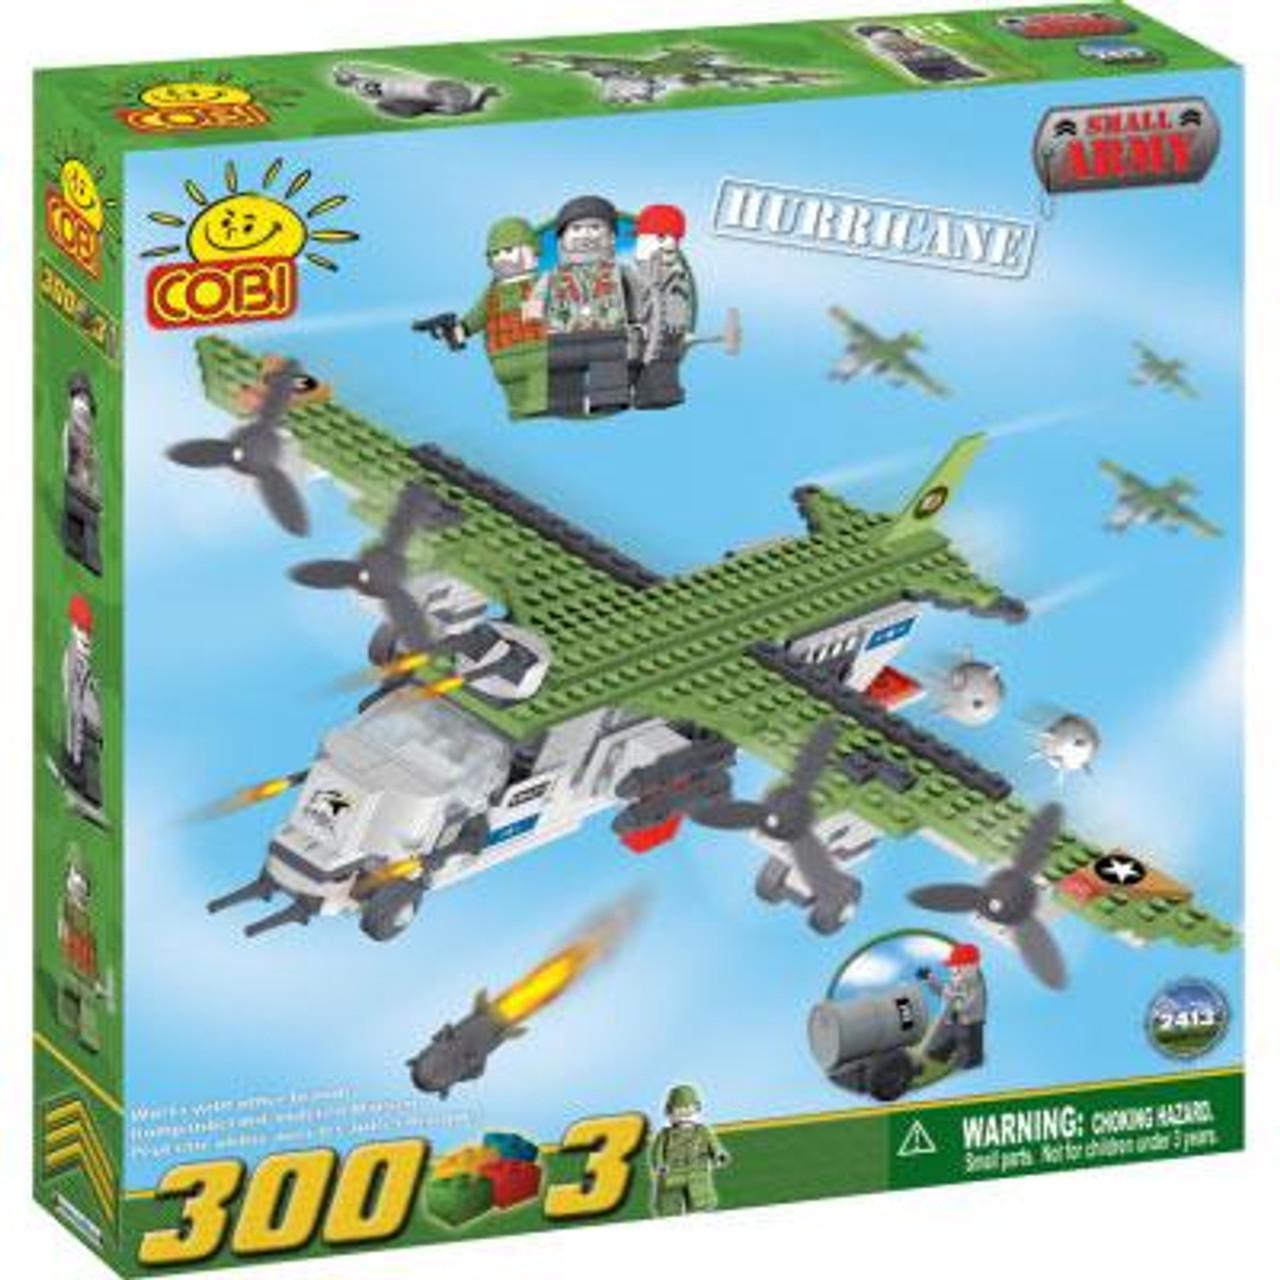 COBI Blocks Small Army Hurricane Set #2413